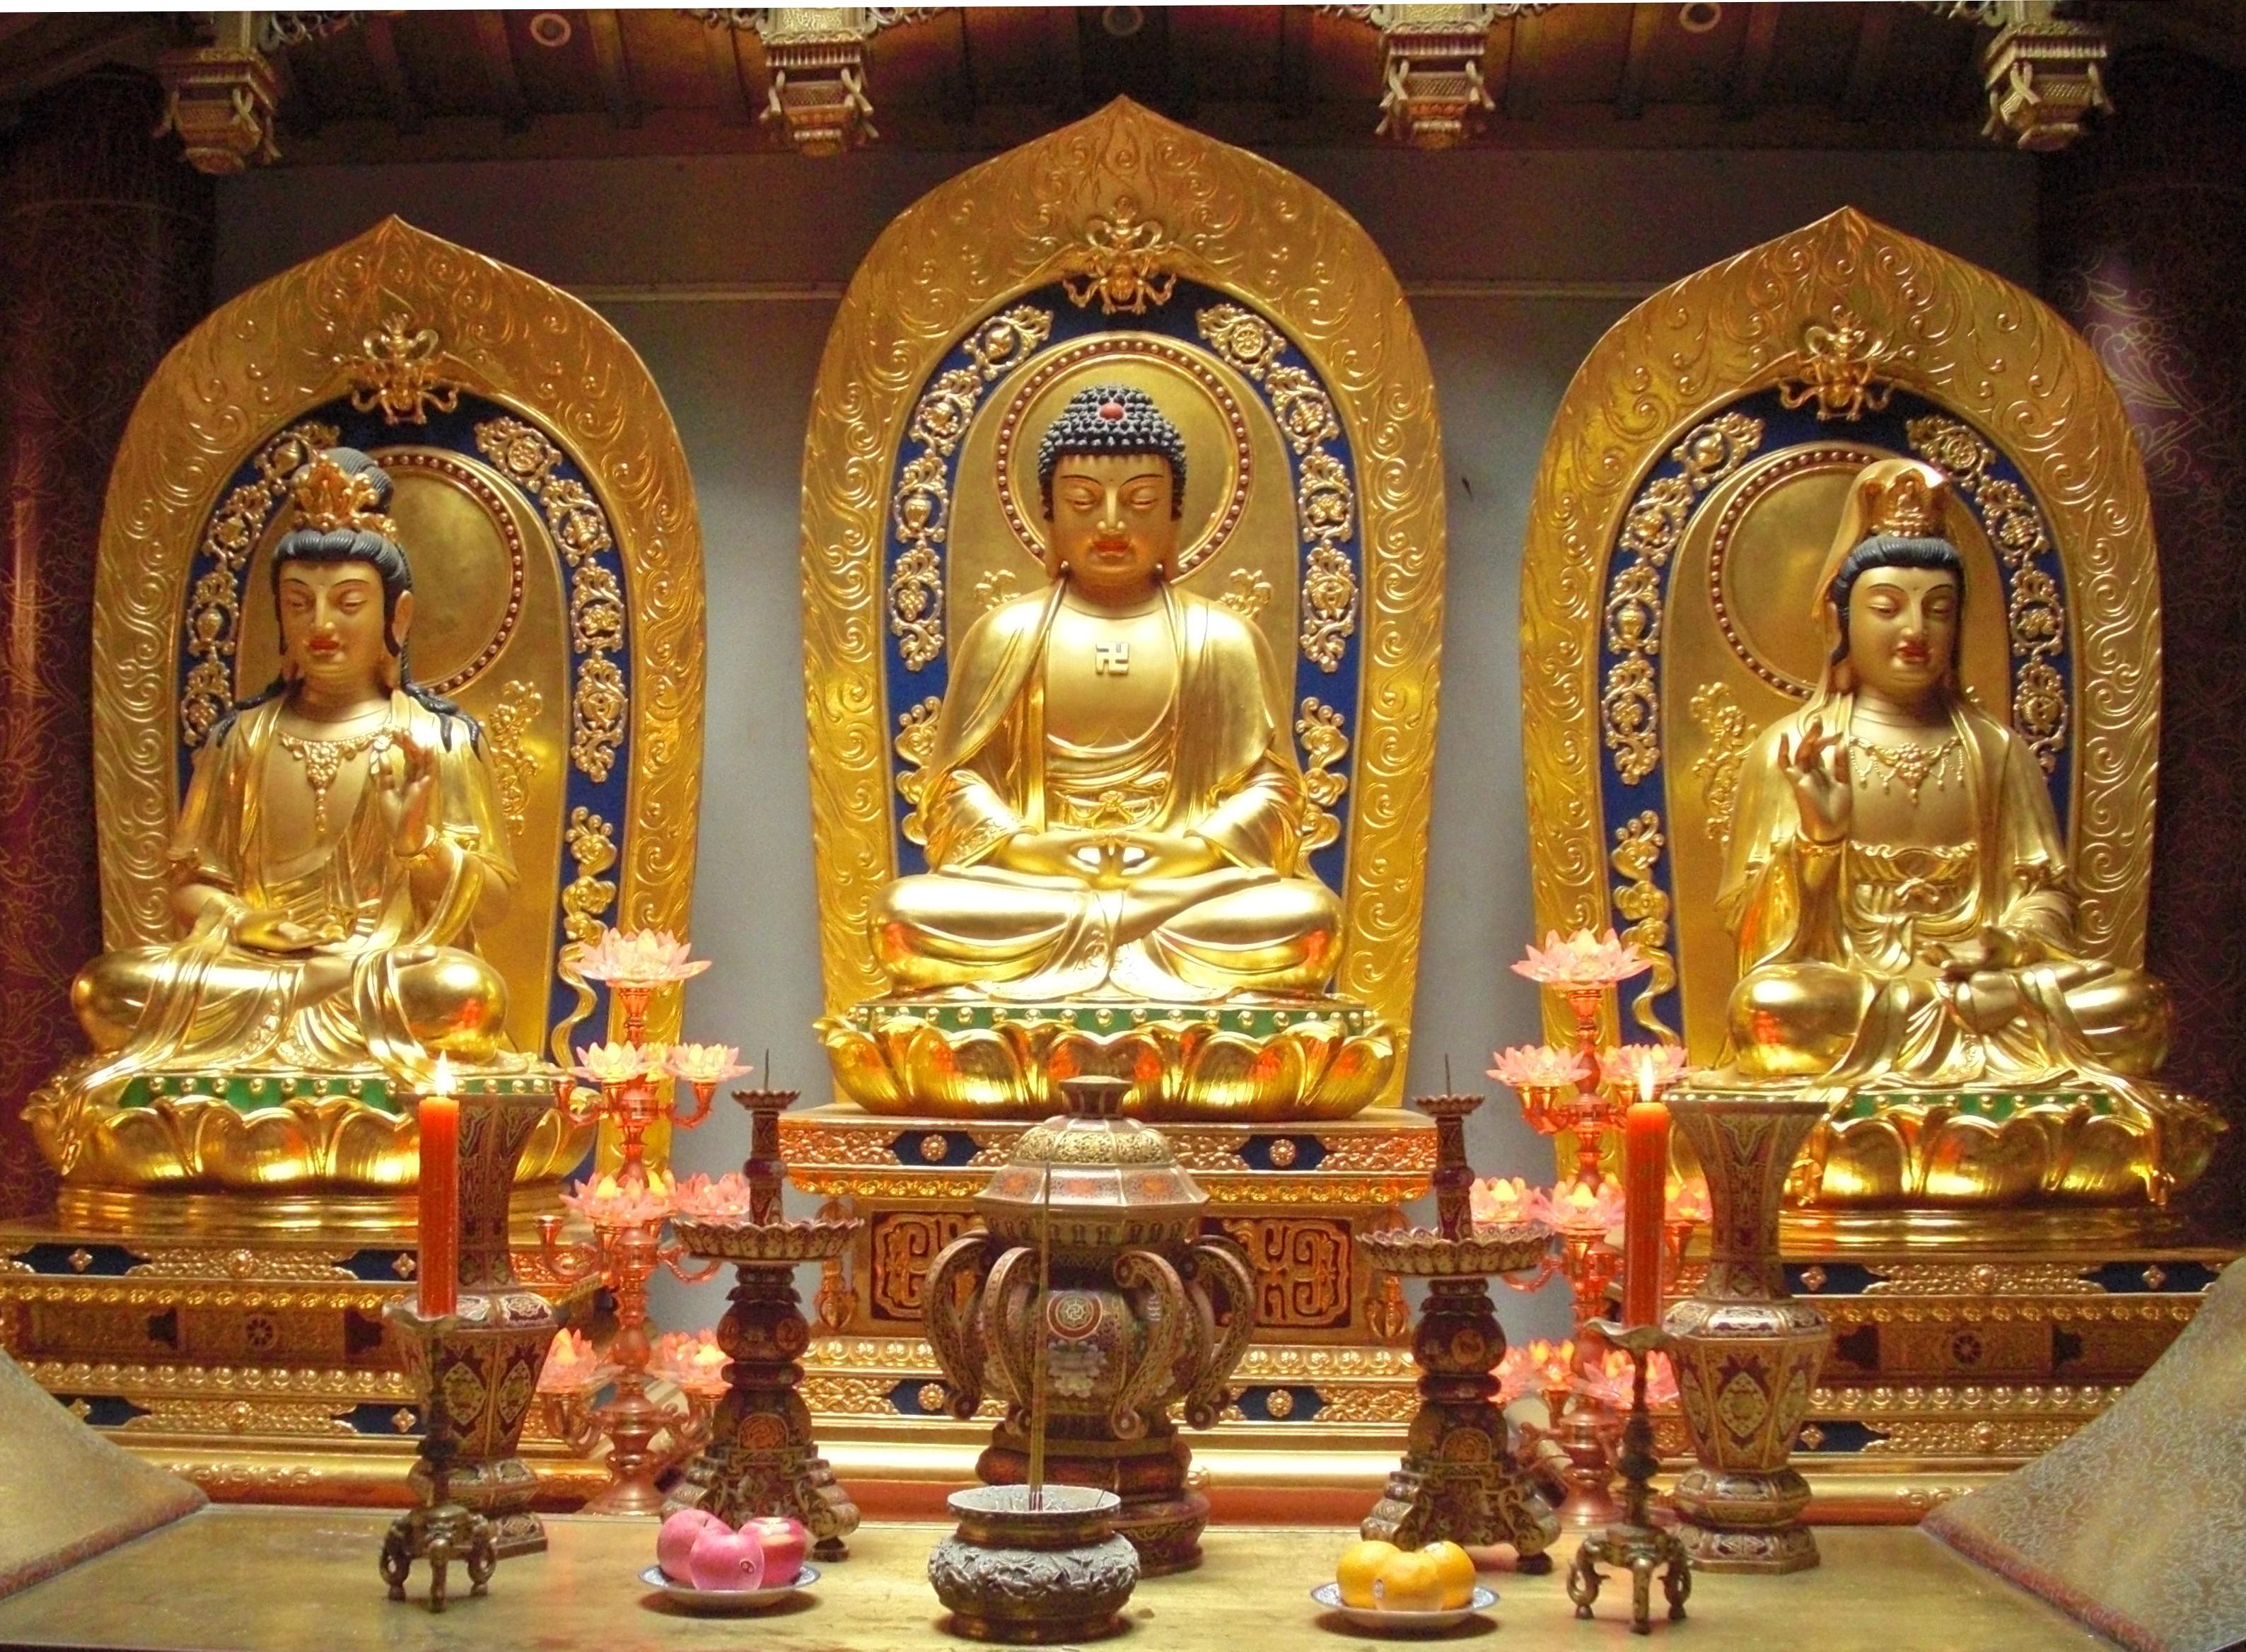 https://i2.wp.com/upload.wikimedia.org/wikipedia/commons/a/ae/Amitabha_Buddha_and_Bodhisattvas.jpeg